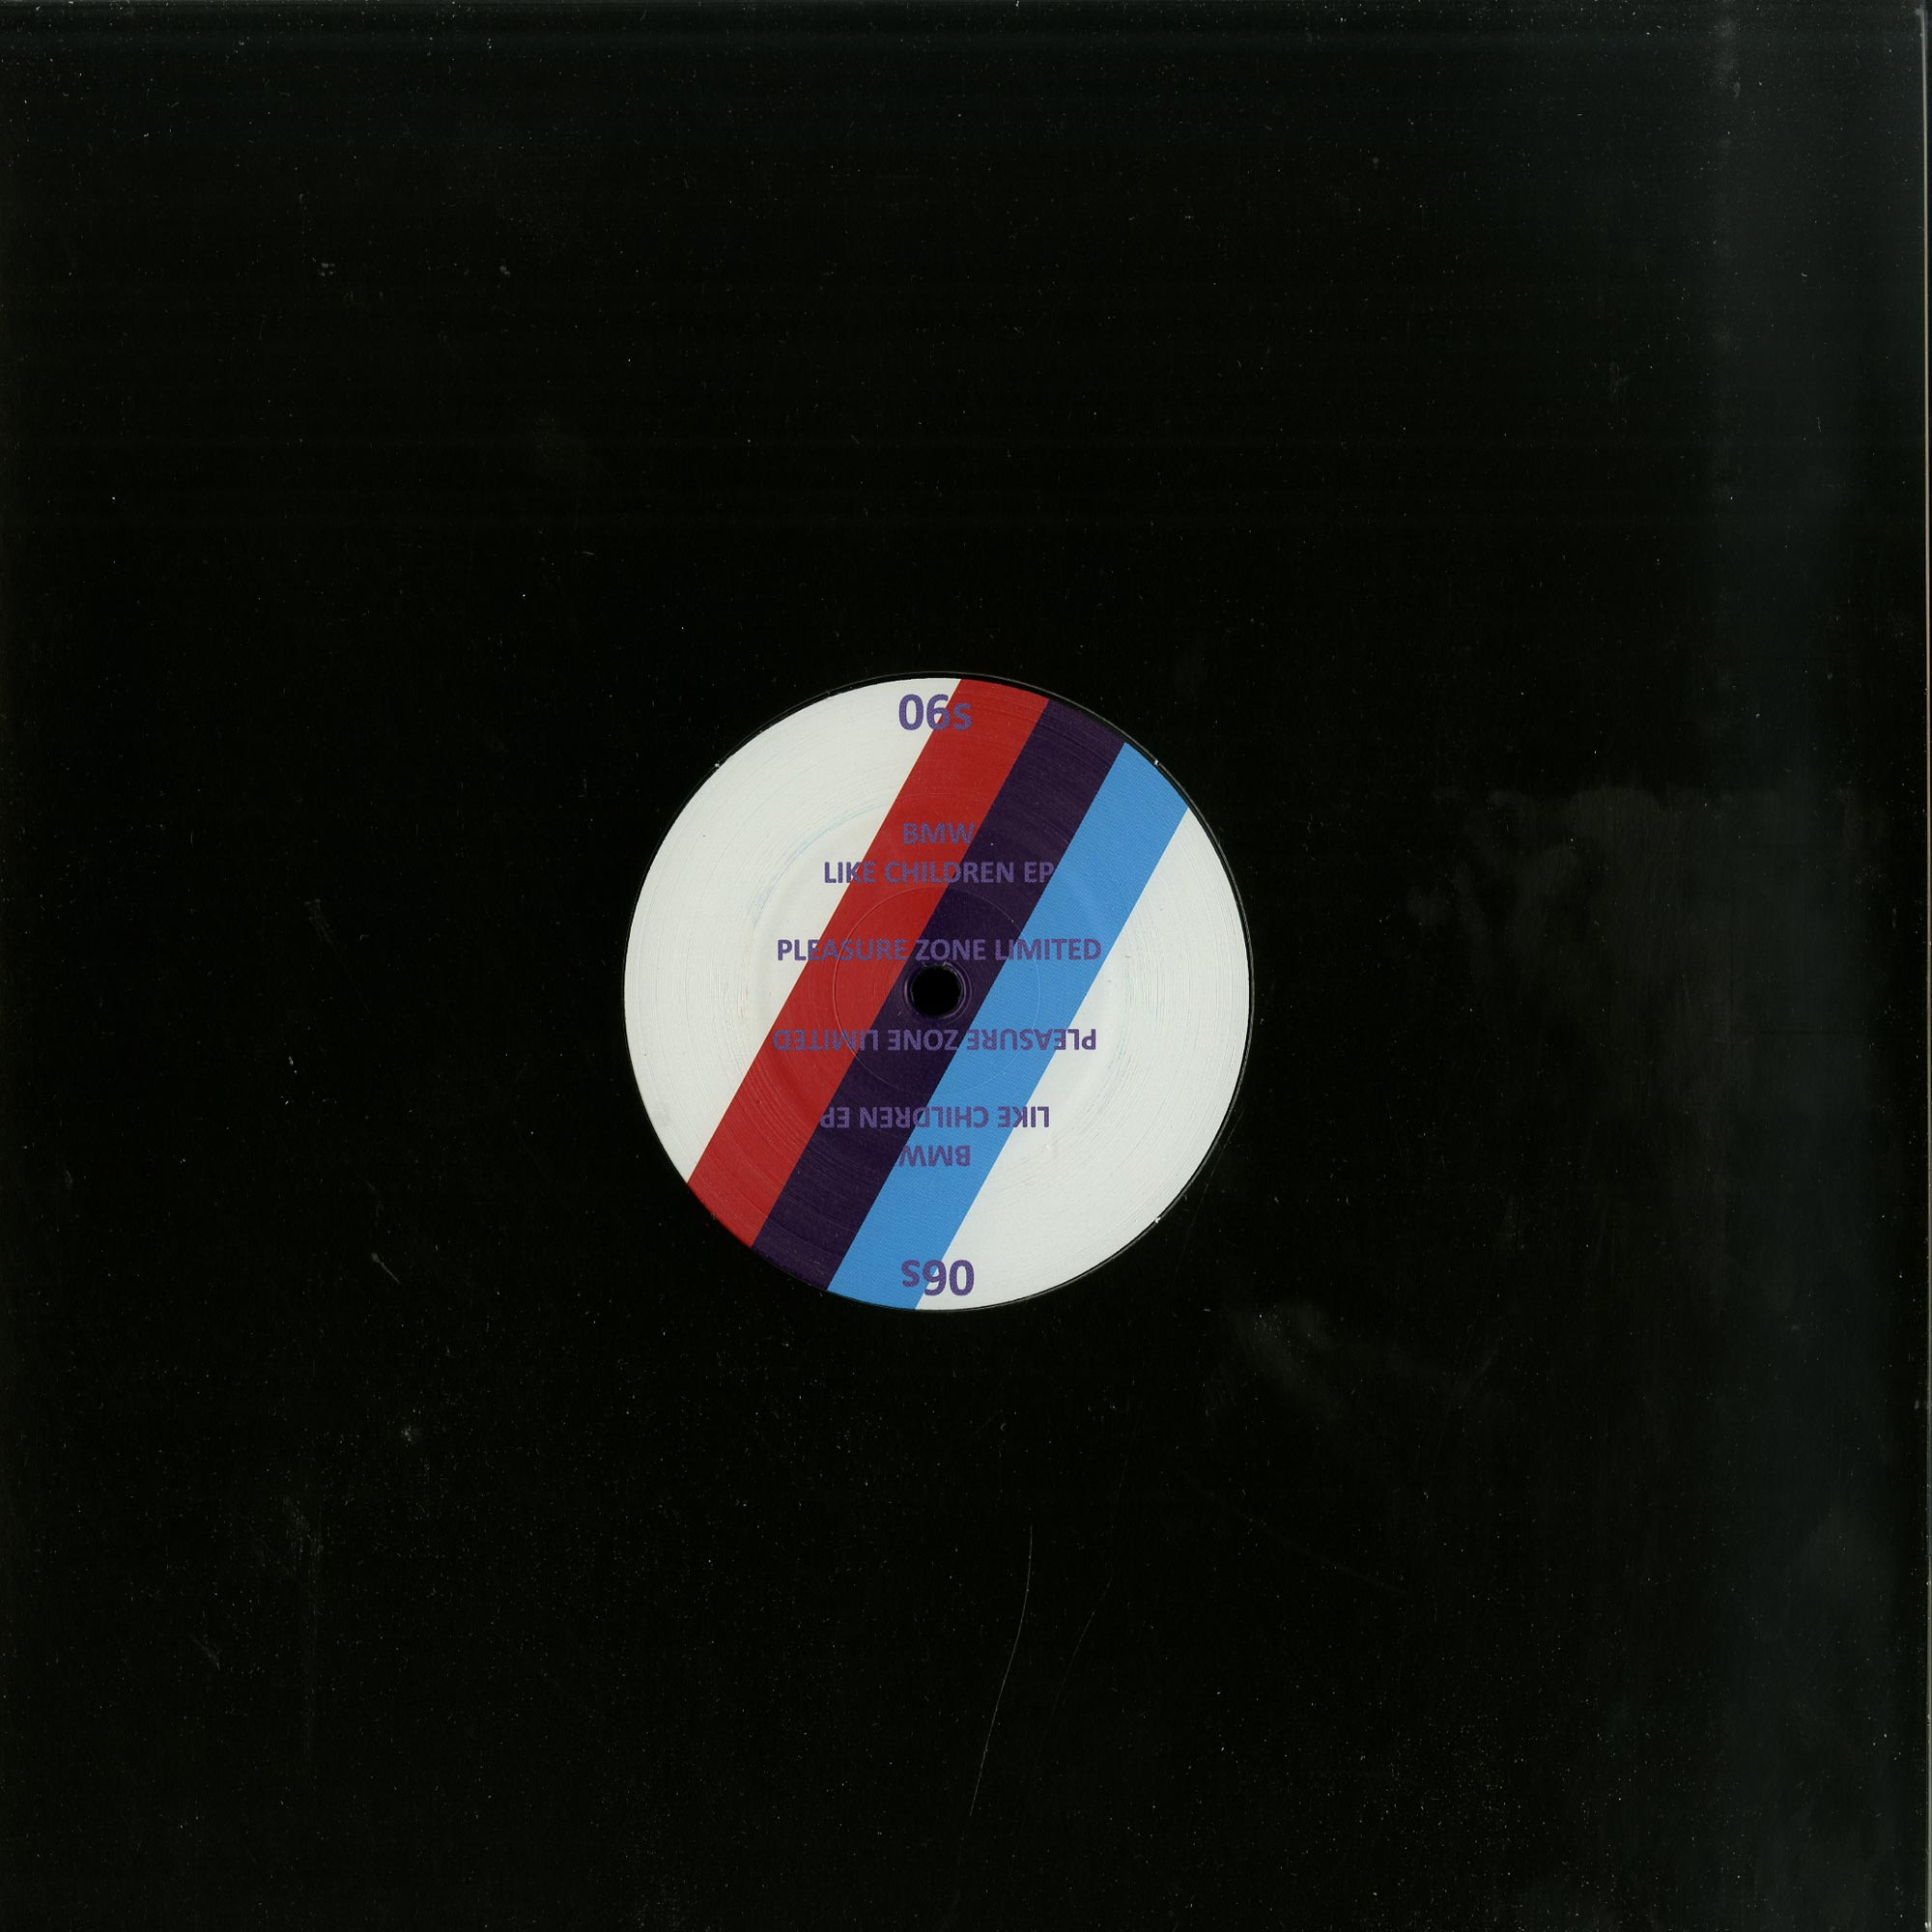 BMW - LIKE CHILDREN EP